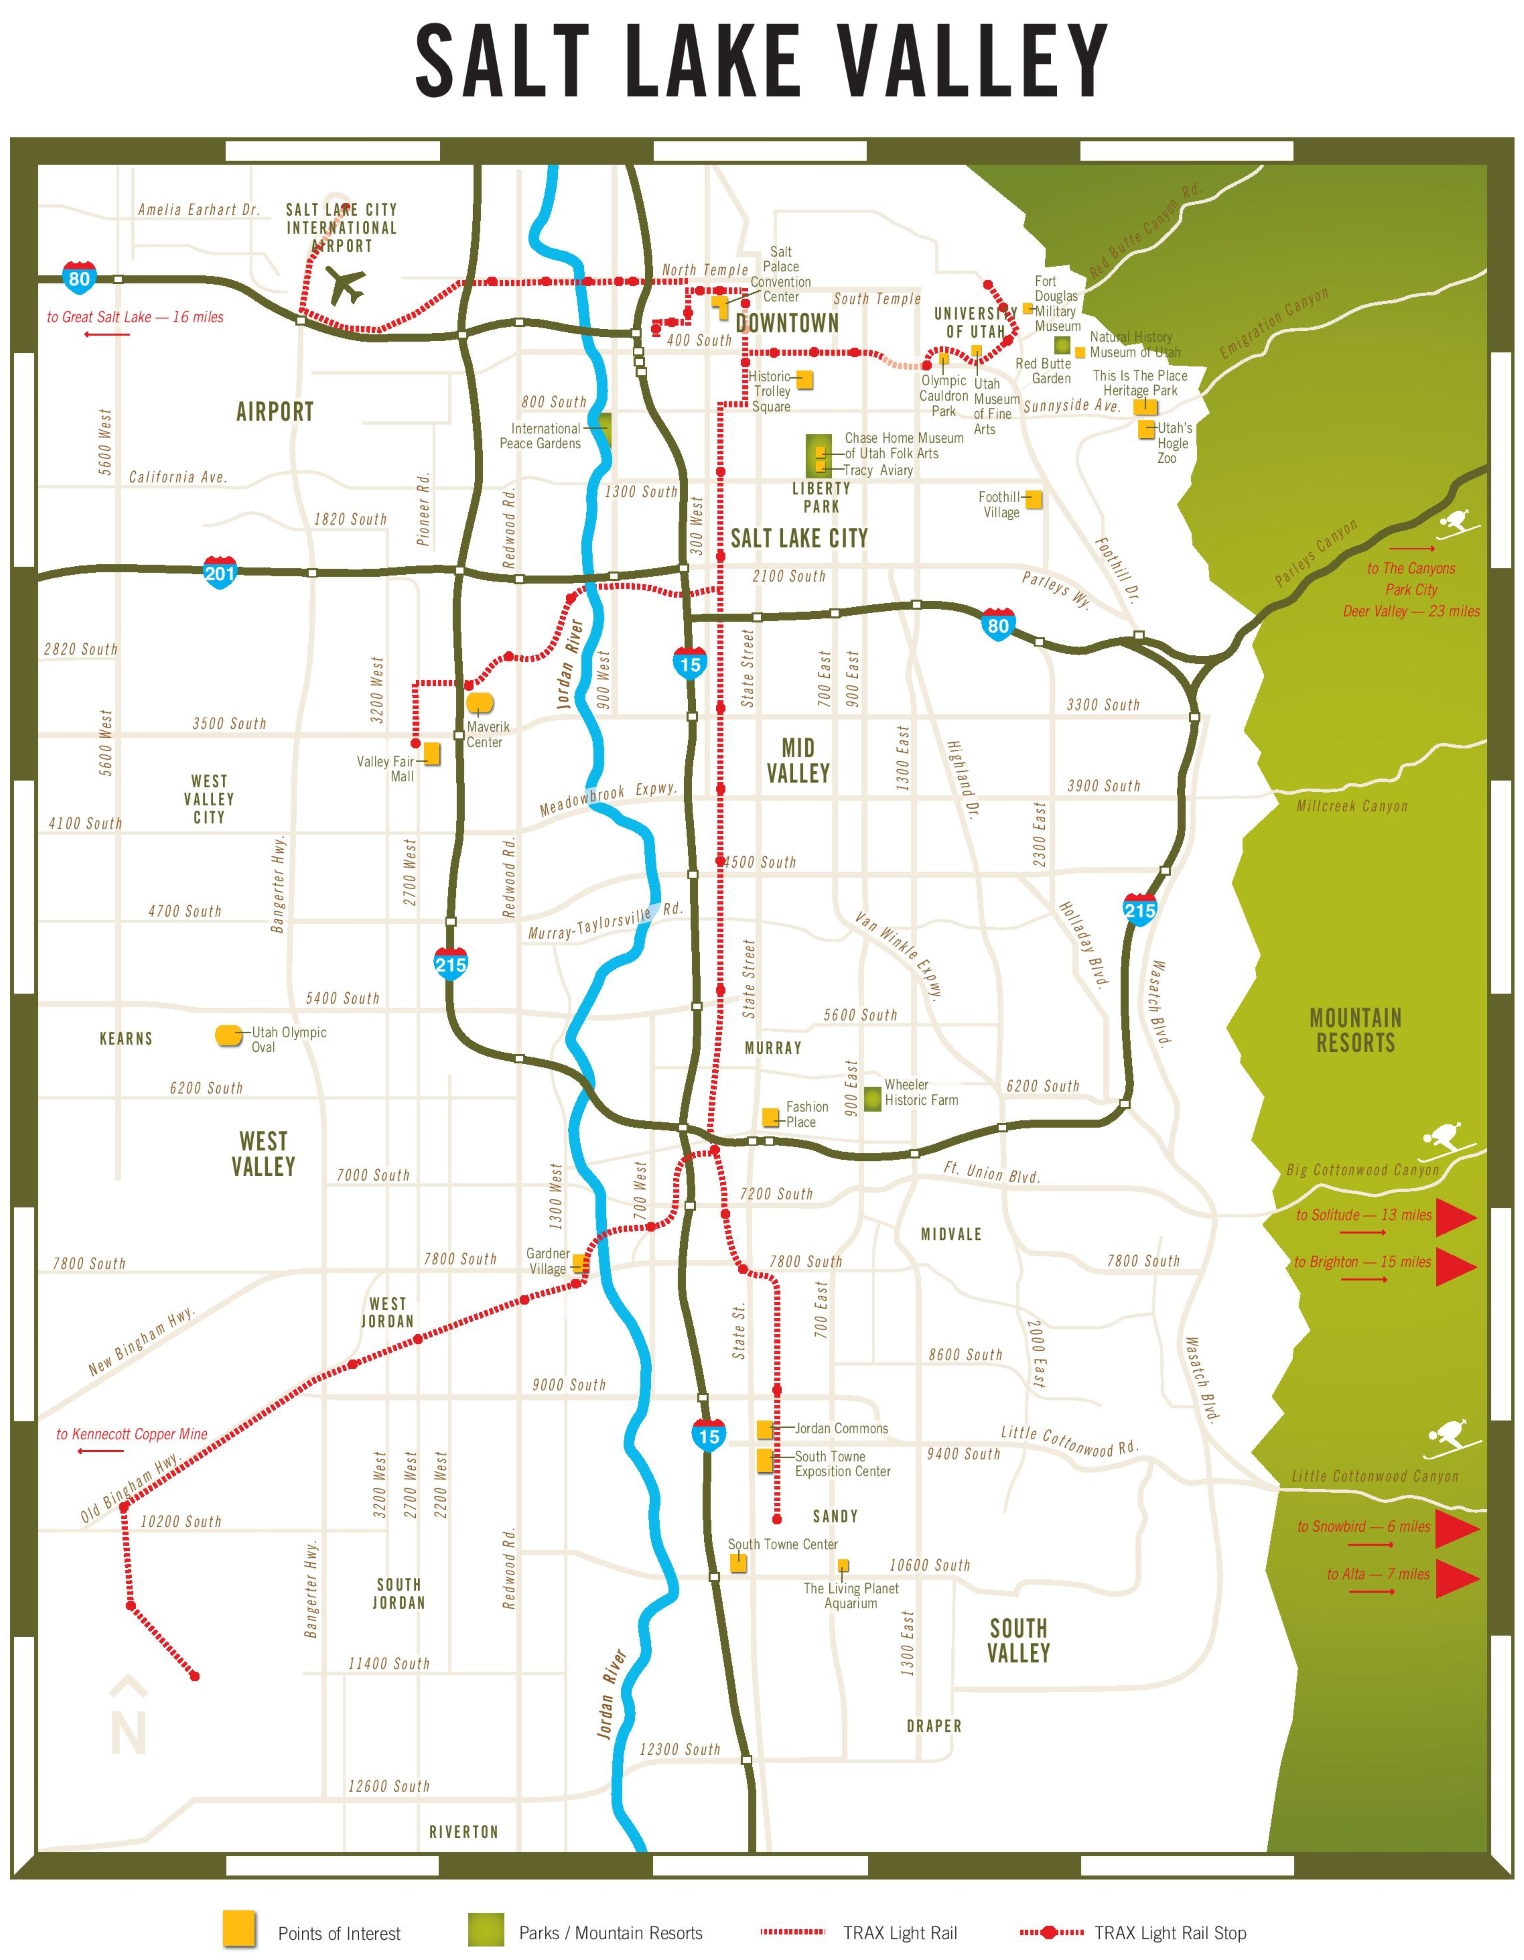 Map Of Salt Lake City Area Salt Lake Valley map